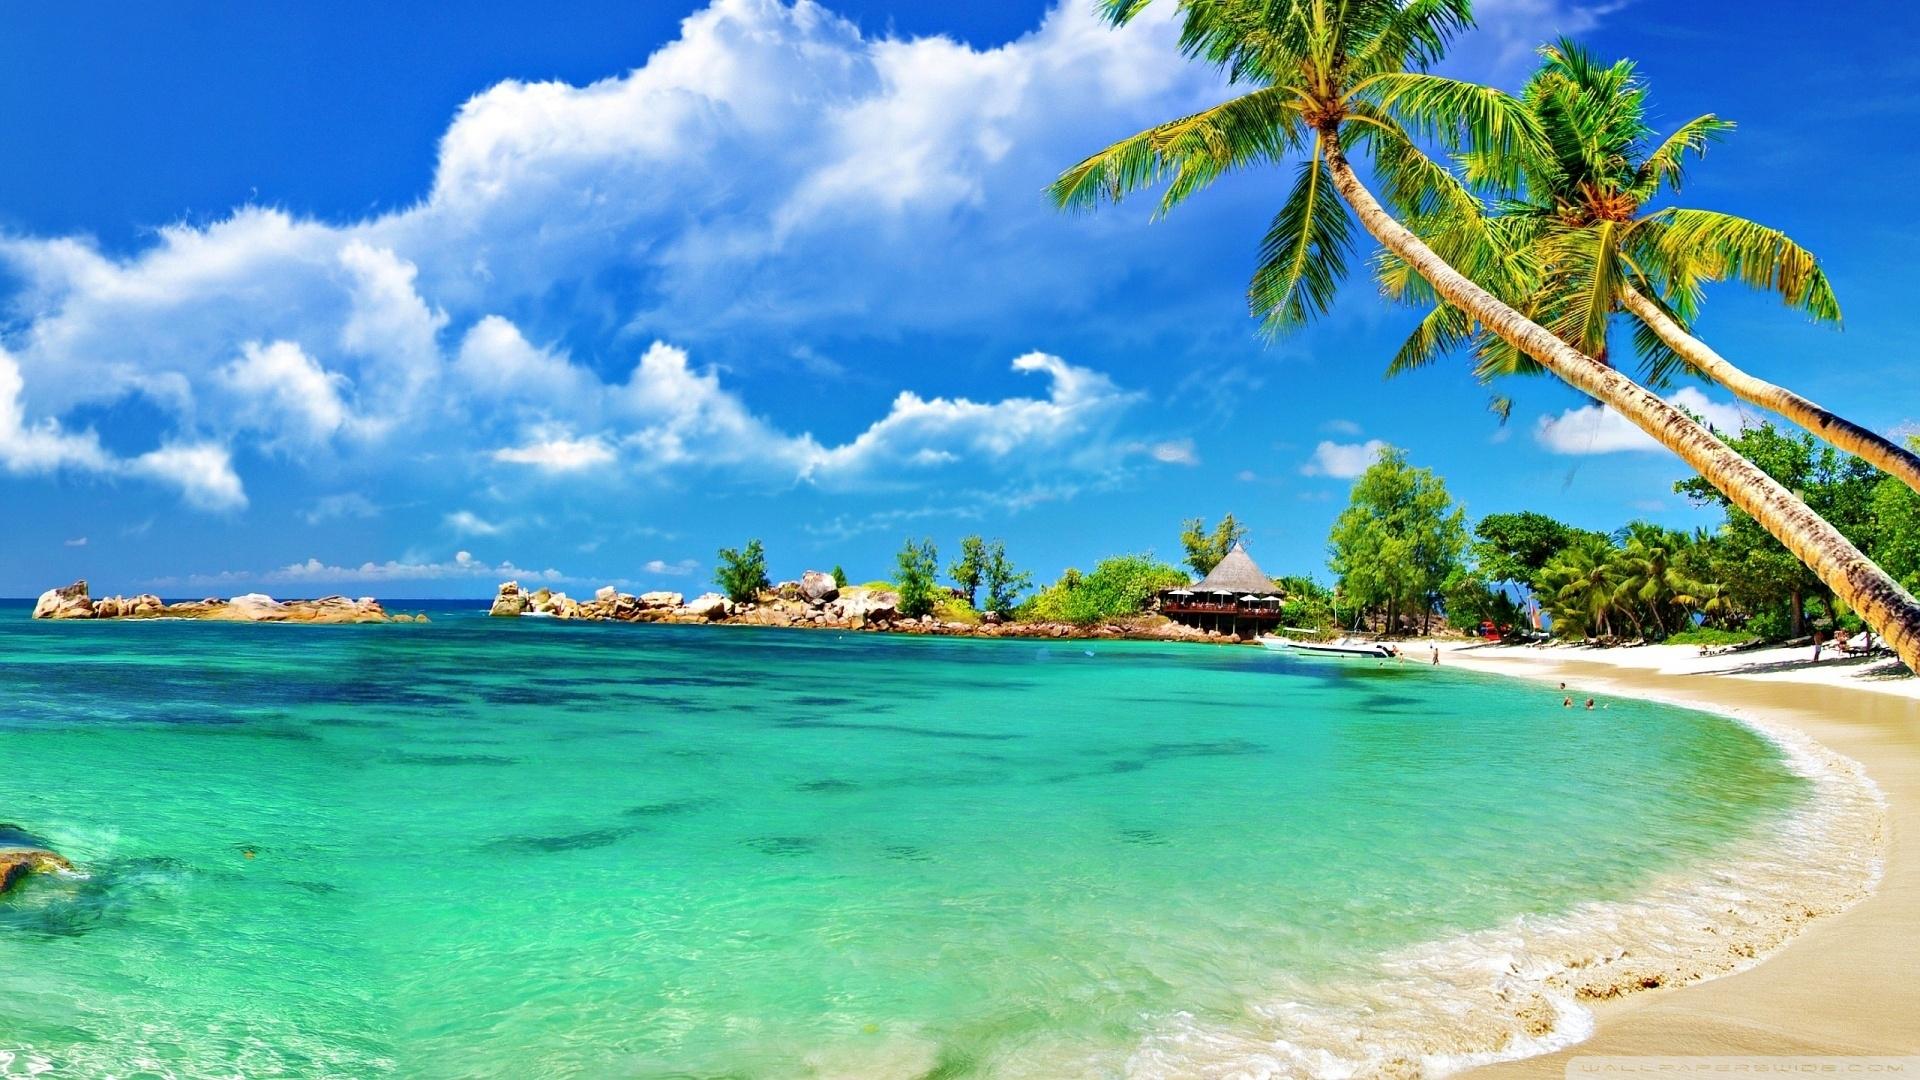 awesome tropical beach ❤ 4k hd desktop wallpaper for 4k ultra hd tv